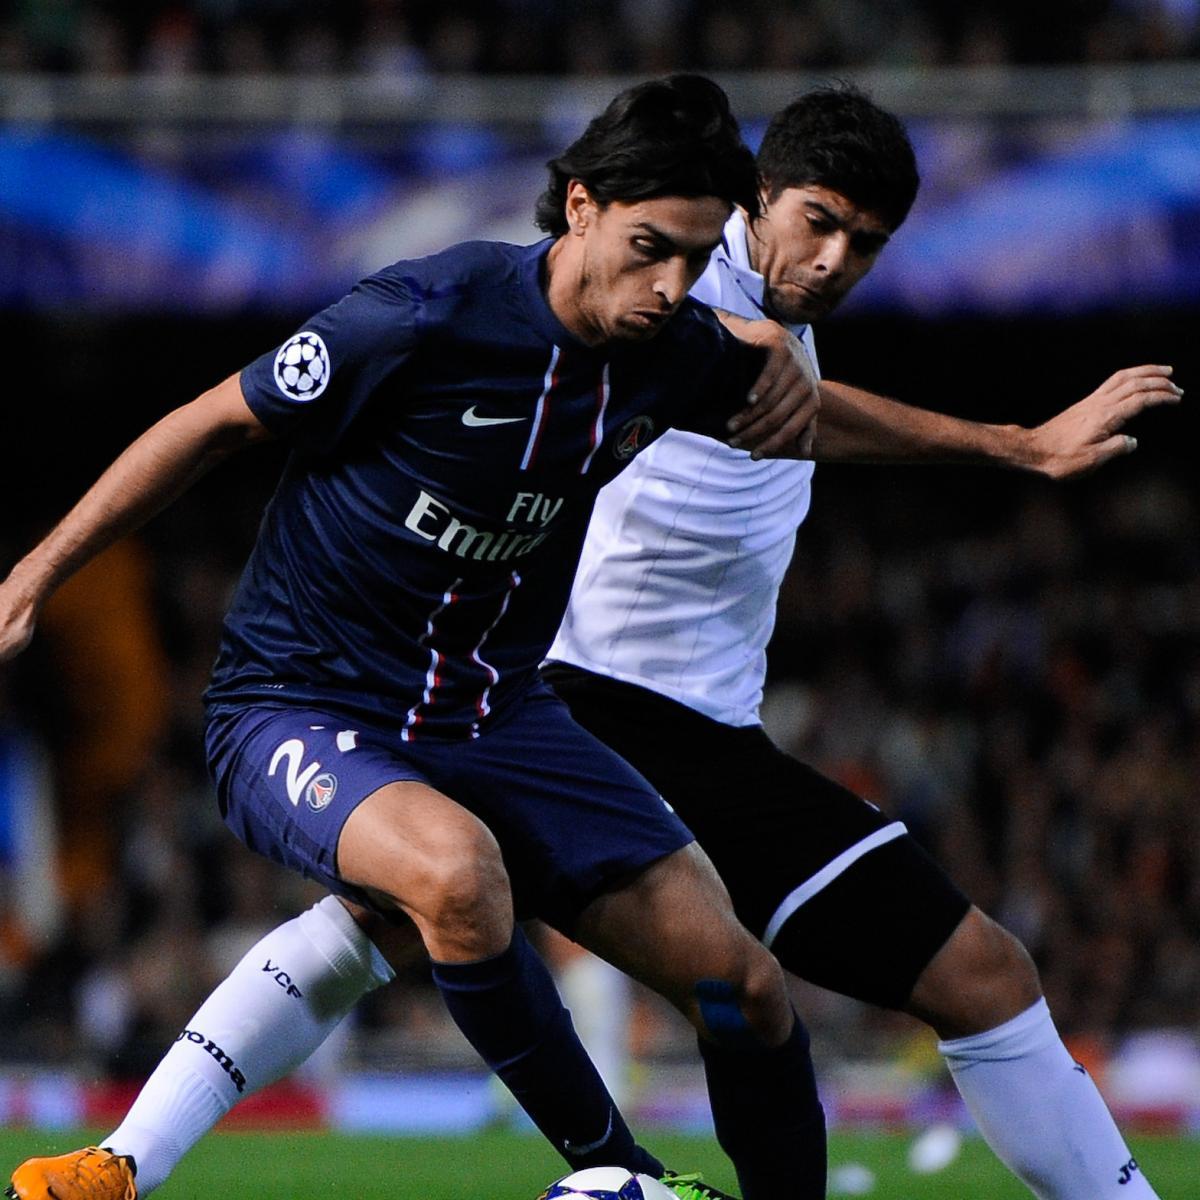 Psg Vs Manchester City Live Score Highlights From: Paris Saint-Germain Vs. Valencia: Champions League Live